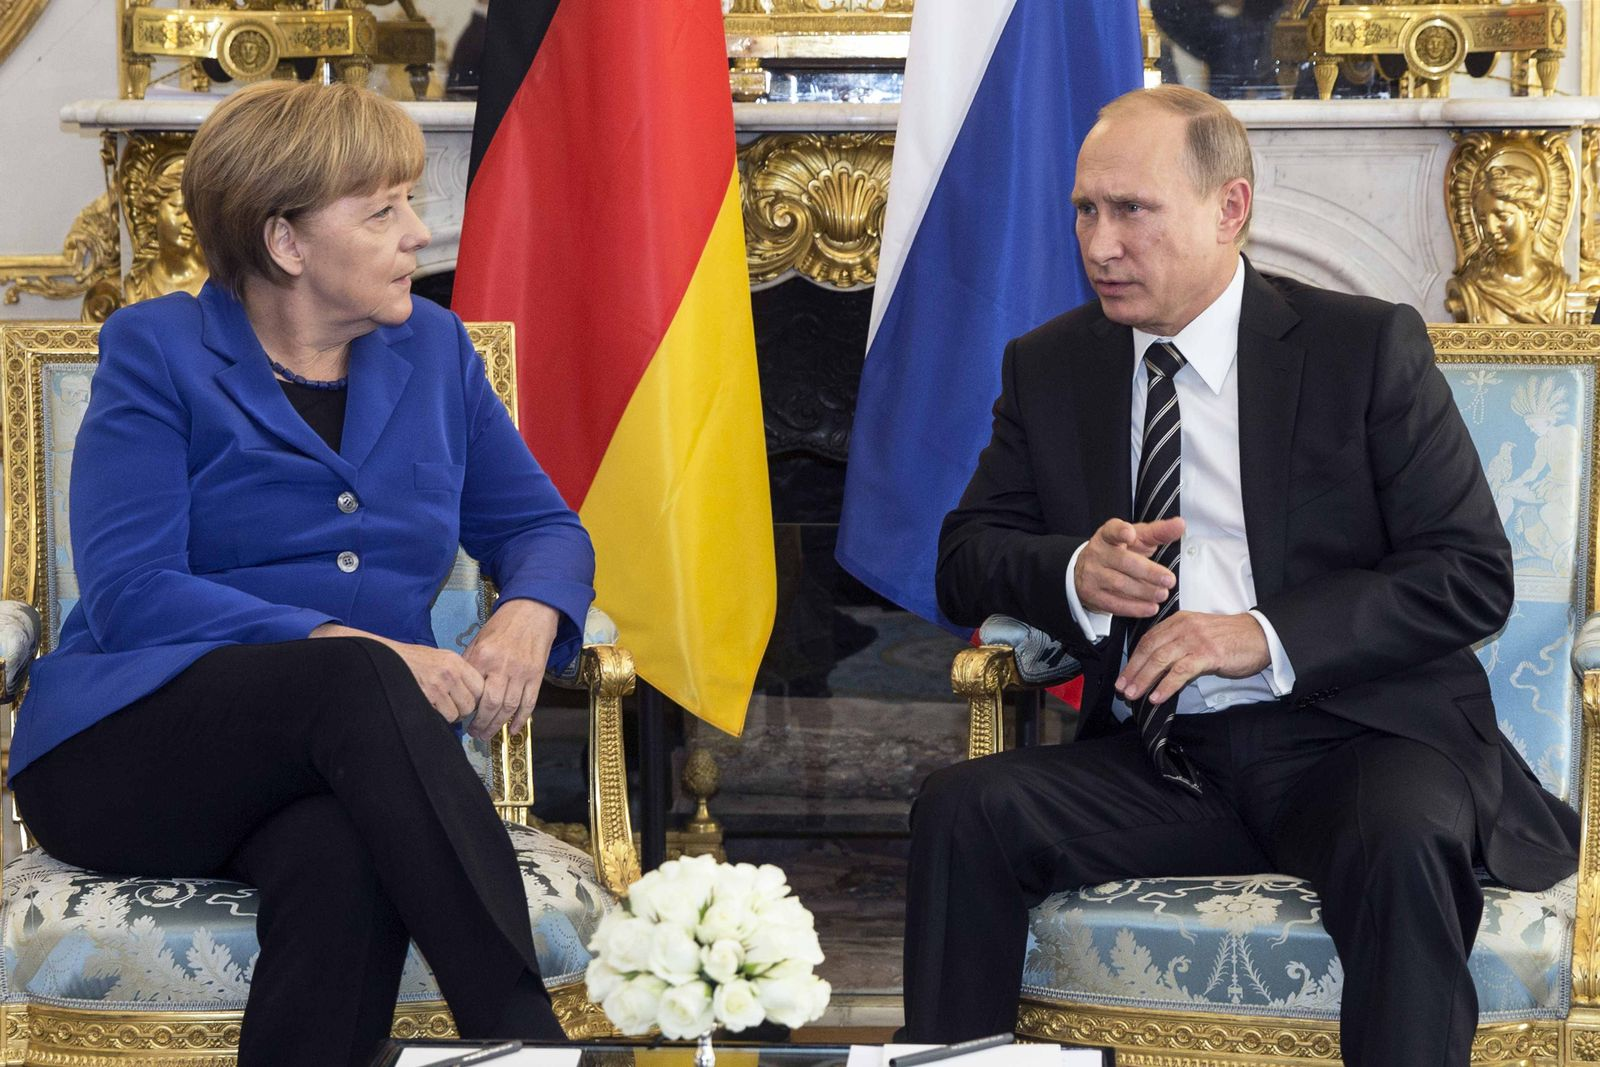 Angela Merkel / Wladimir Putin